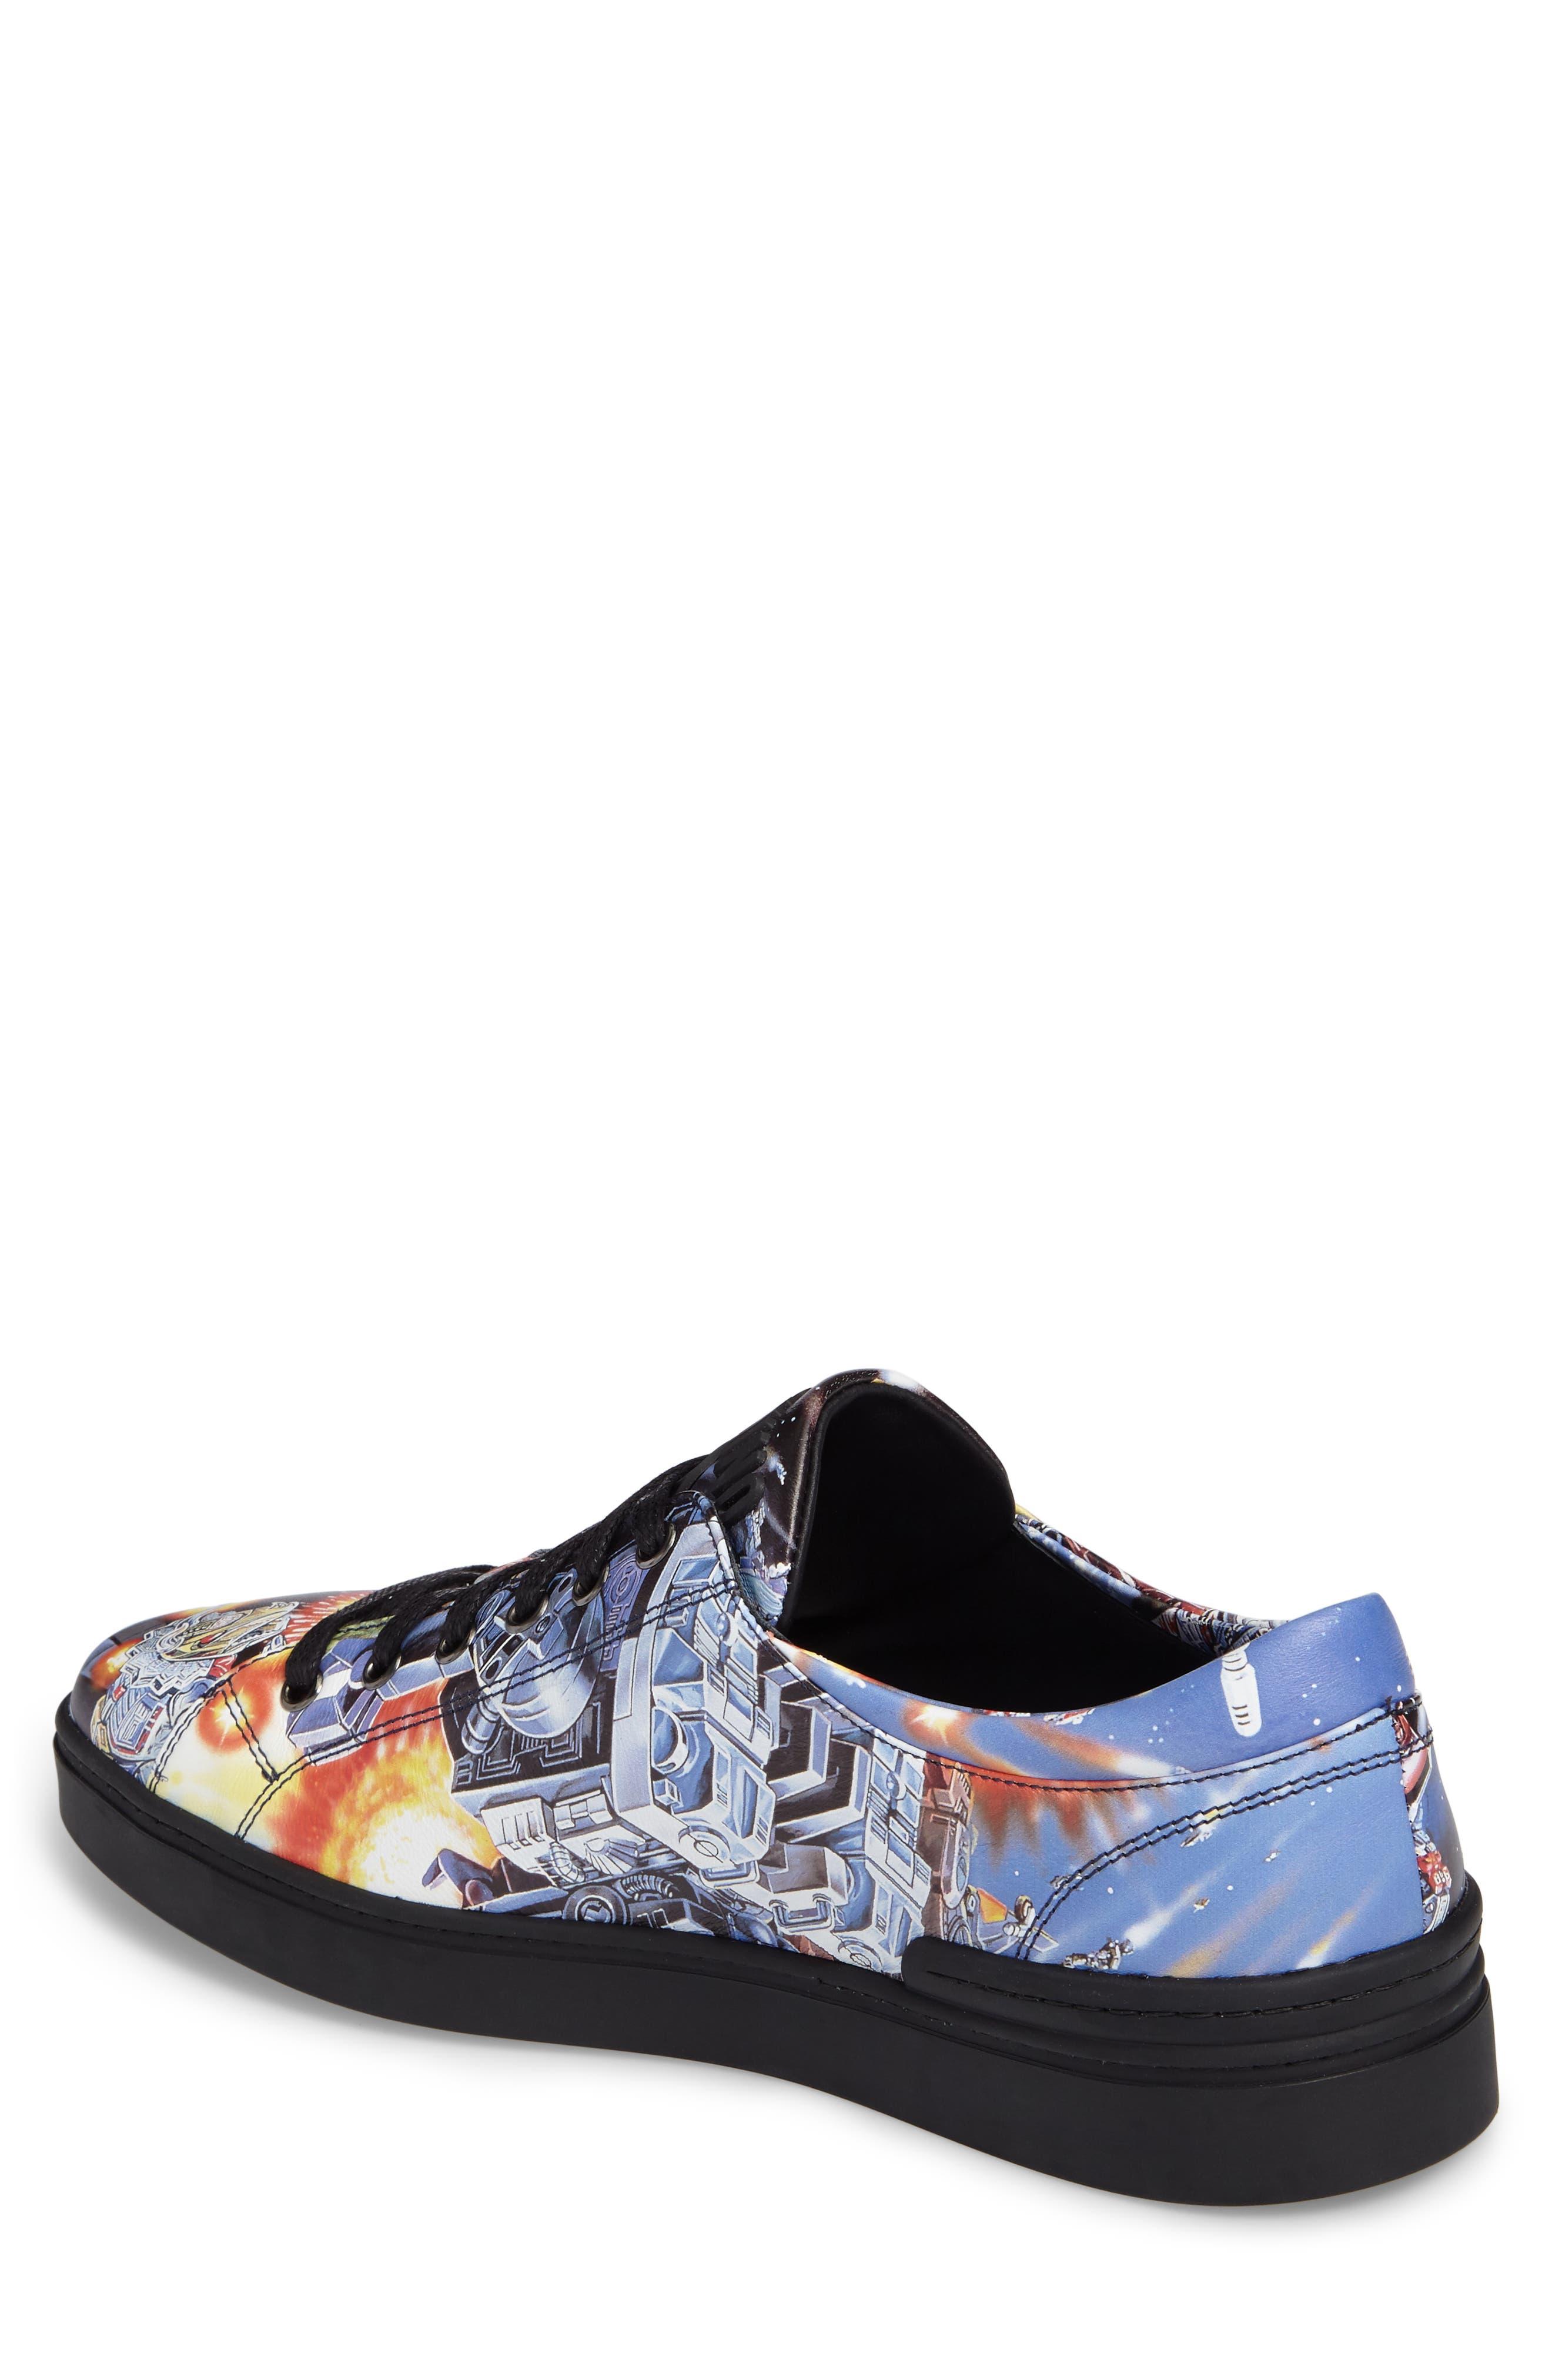 Transformers Print Low Top Sneaker,                             Alternate thumbnail 2, color,                             004